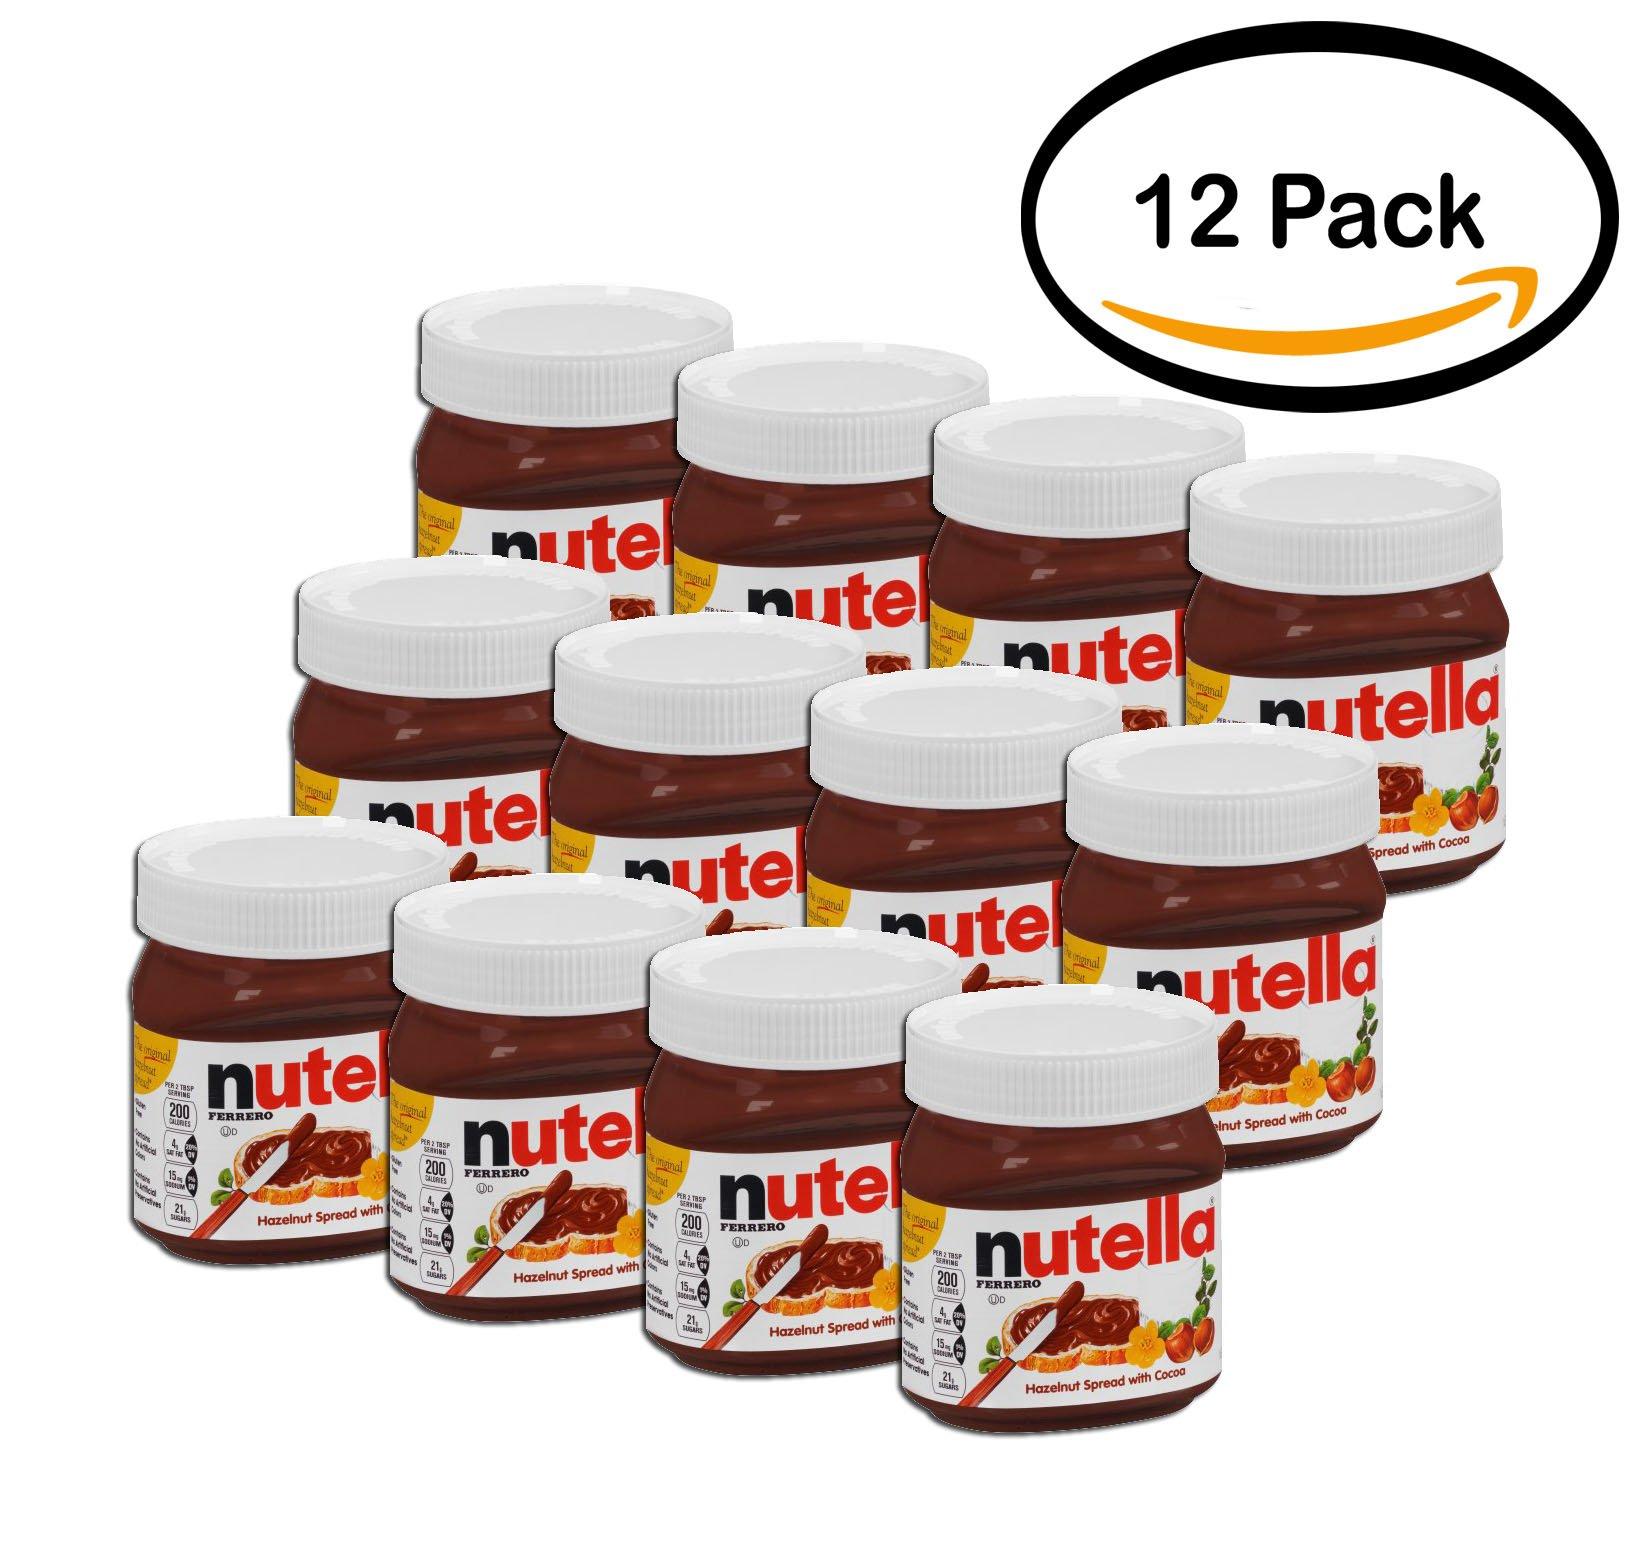 PACK OF 12 - Nutella Hazelnut Spread 13 oz. Jar by Nutella